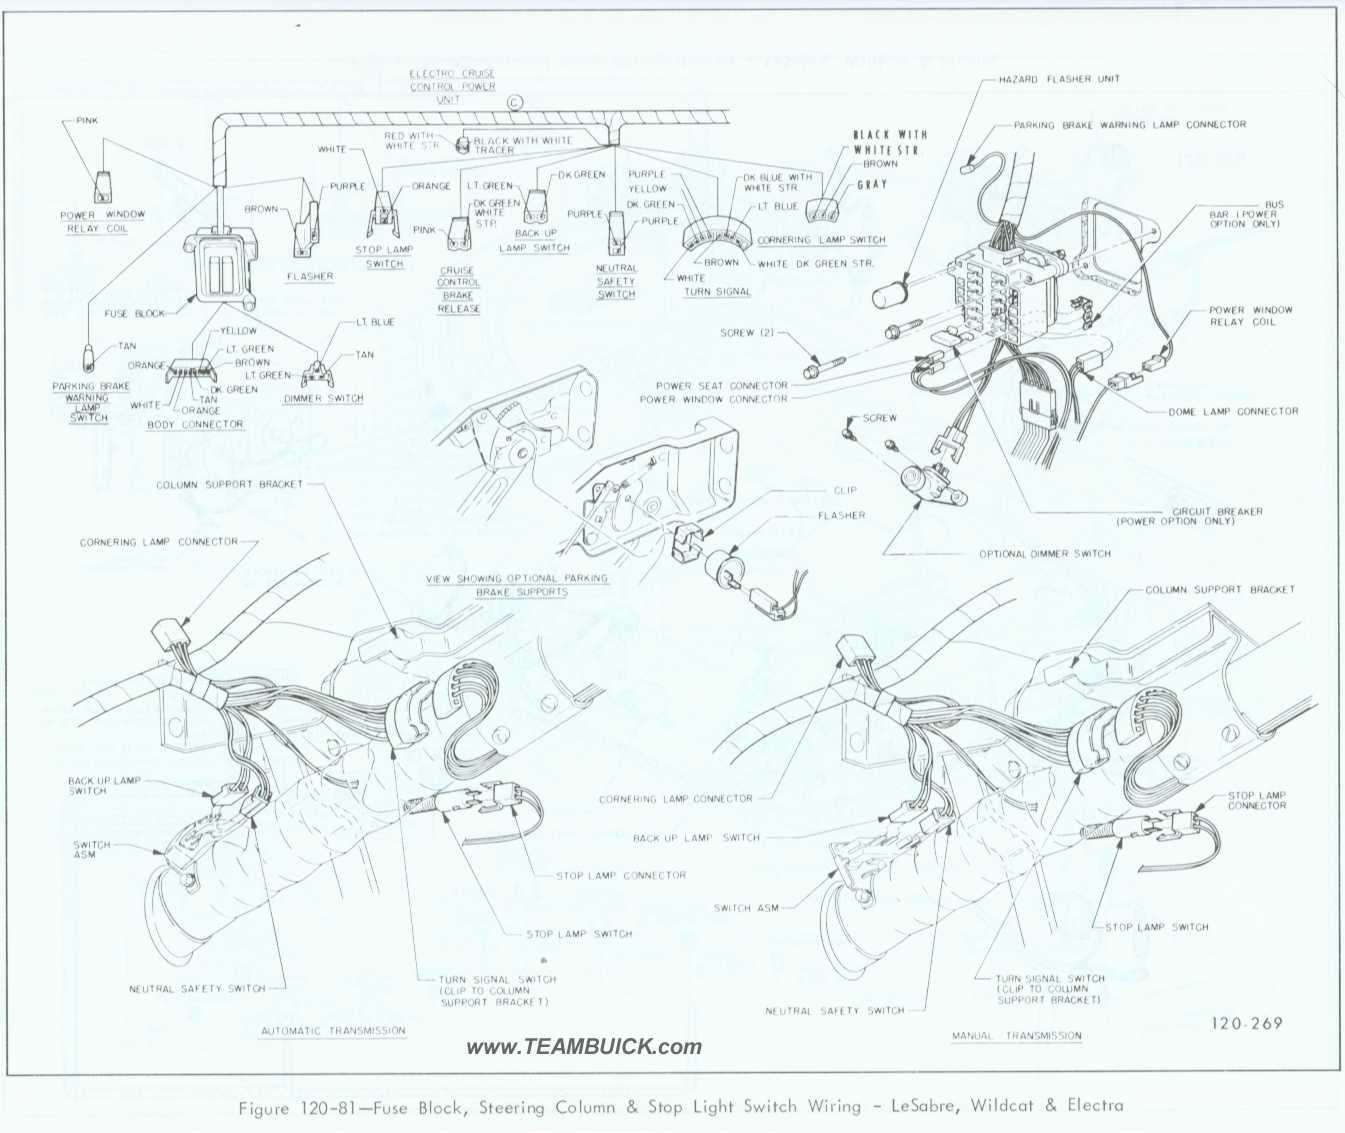 2000 Buick Lesabre Power Steering Diagram Fuse Box 1995 1967 Wildcat Electra Block Column Rh Teambuick Com